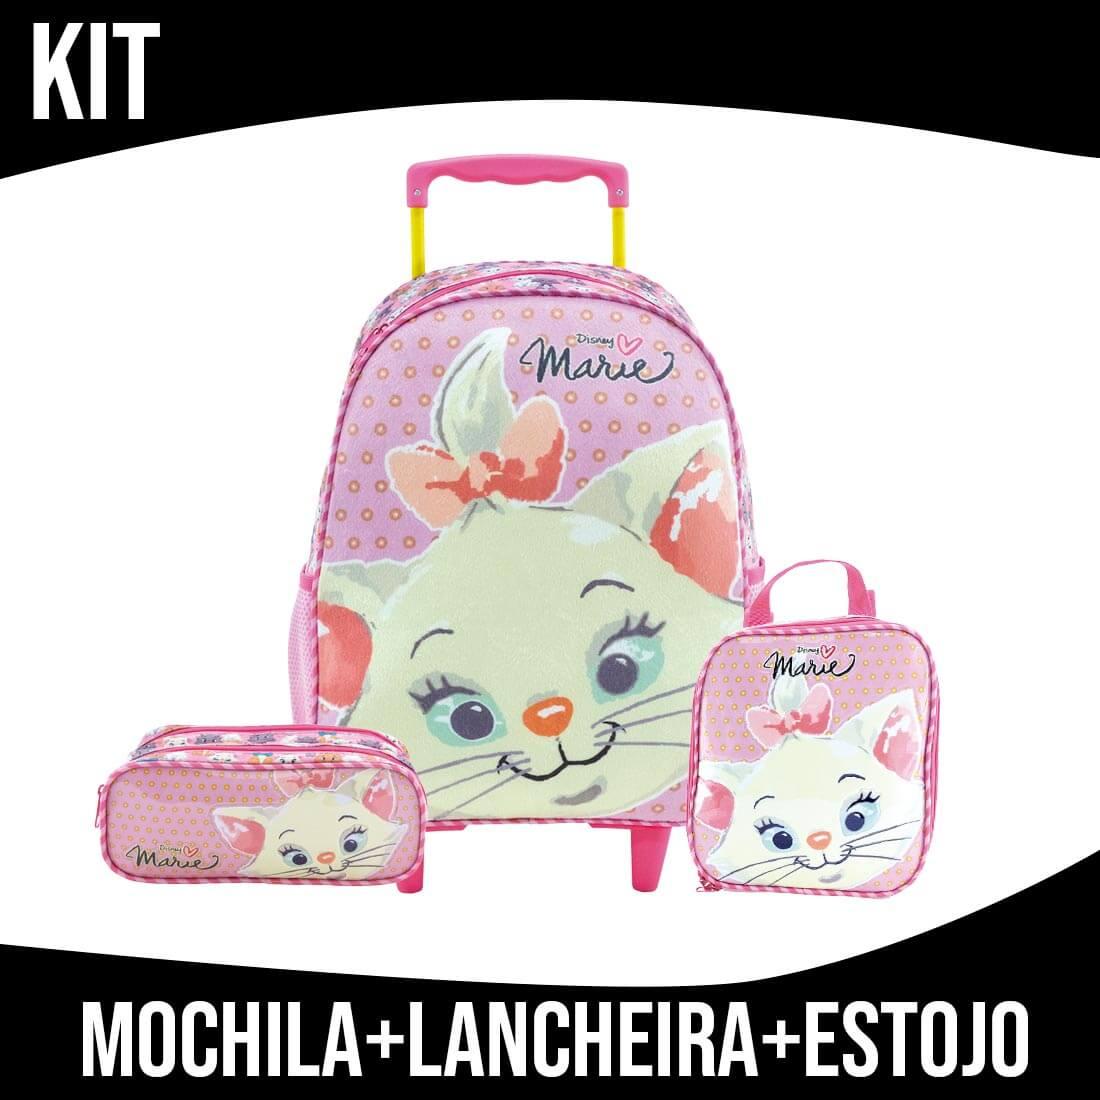 Kit Mochila Infantil Com Rodinha Marie Cuteness Xeryus